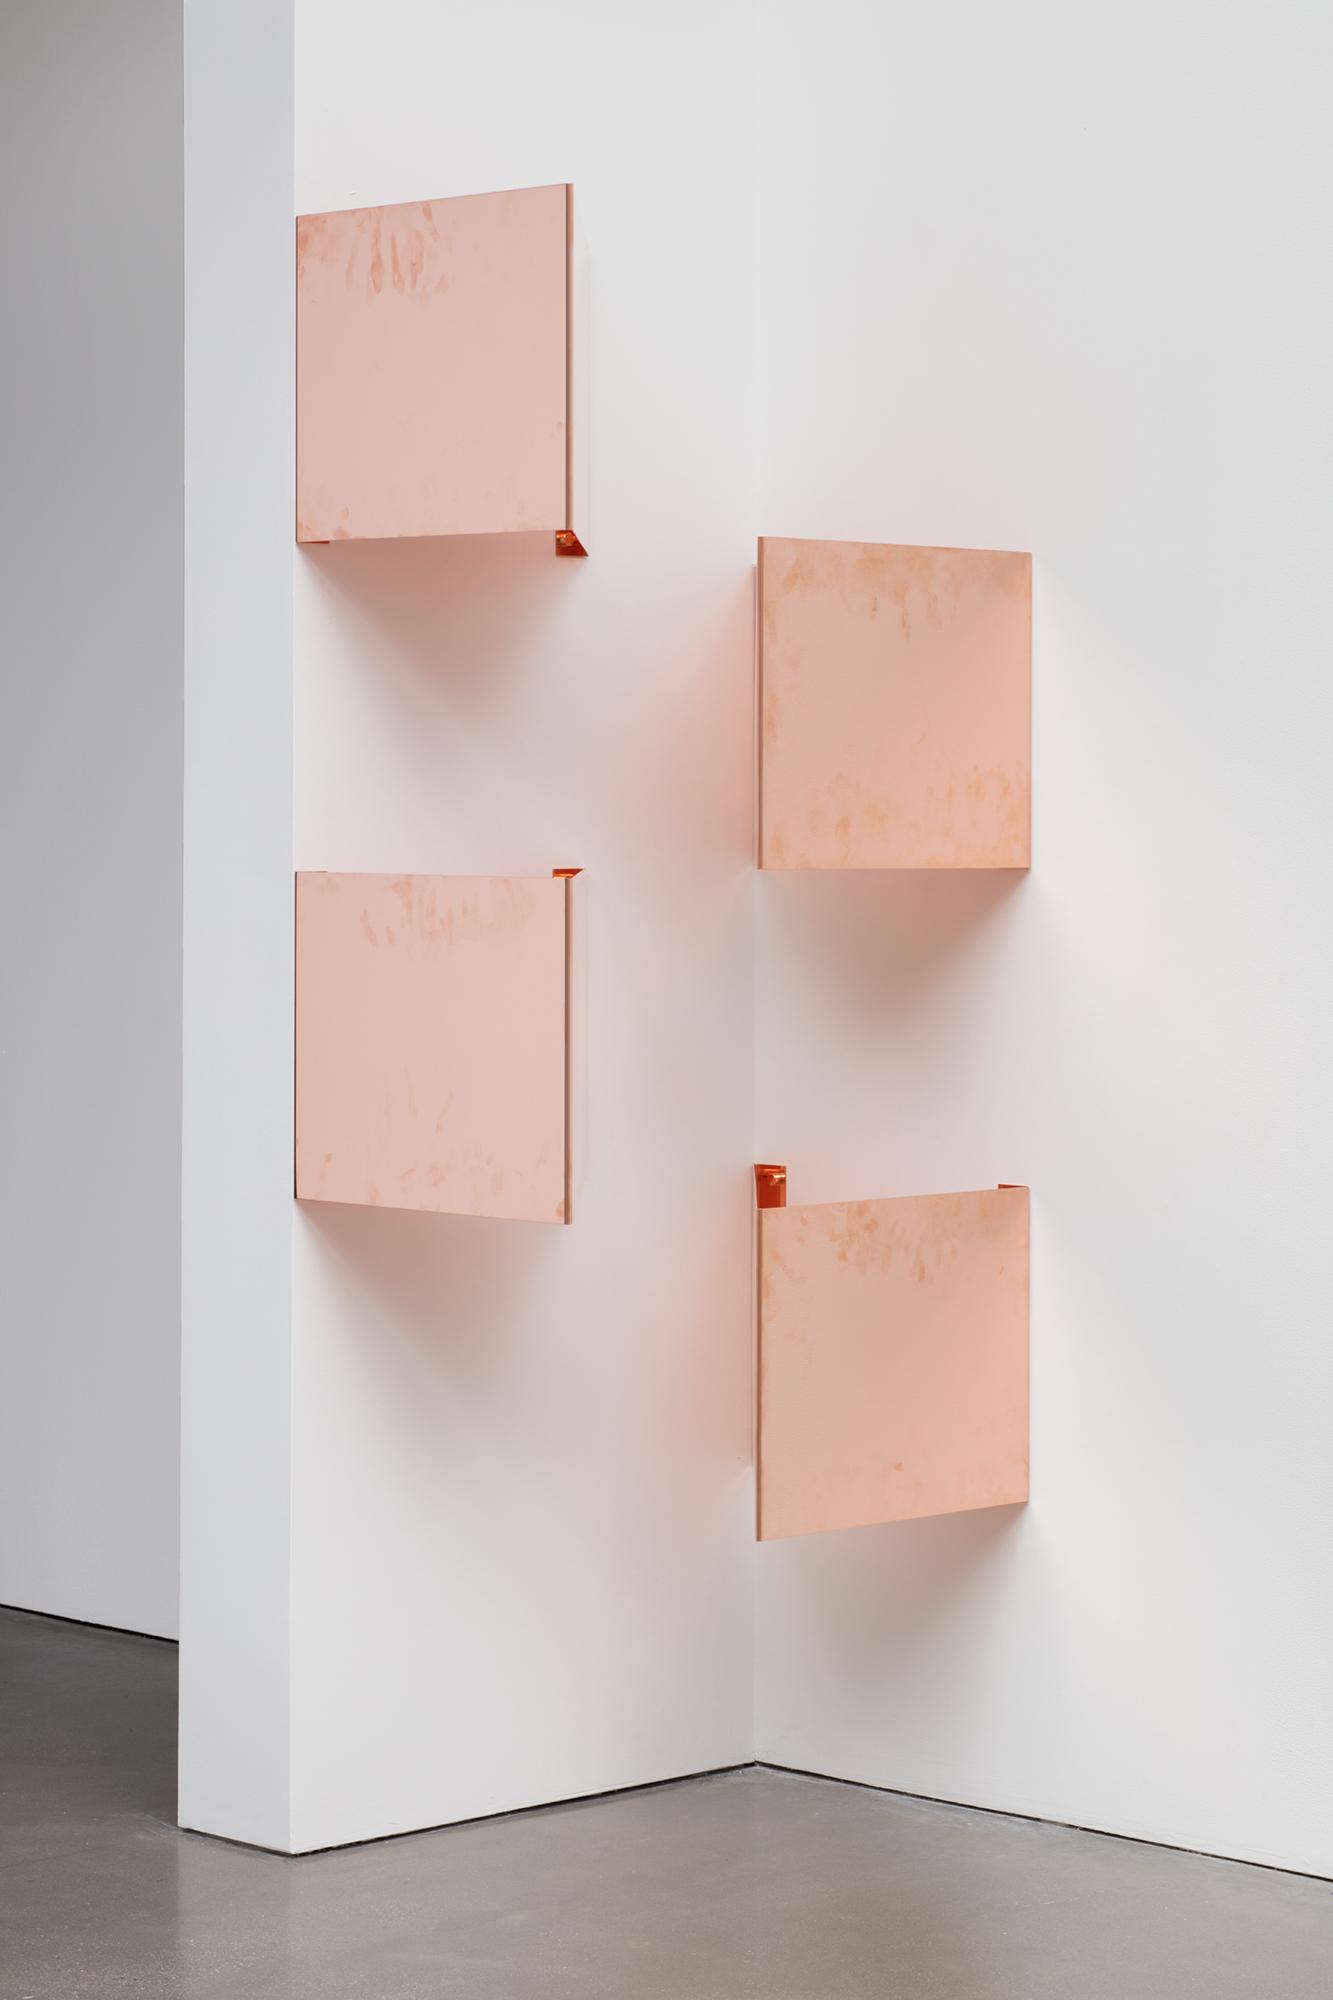 "Copper Surrogates (48"" x 120"" 48 ounce C11000 Copper Alloy, 45º/45º/90º, February 23–27/April 9, 2018, Los Angeles, California)    2018–   Polished copper  18 1/2 x 14 1/16 x 18 1/2 inches each, 4 parts   Surrogates (Modular, Art Handling), 2014–"